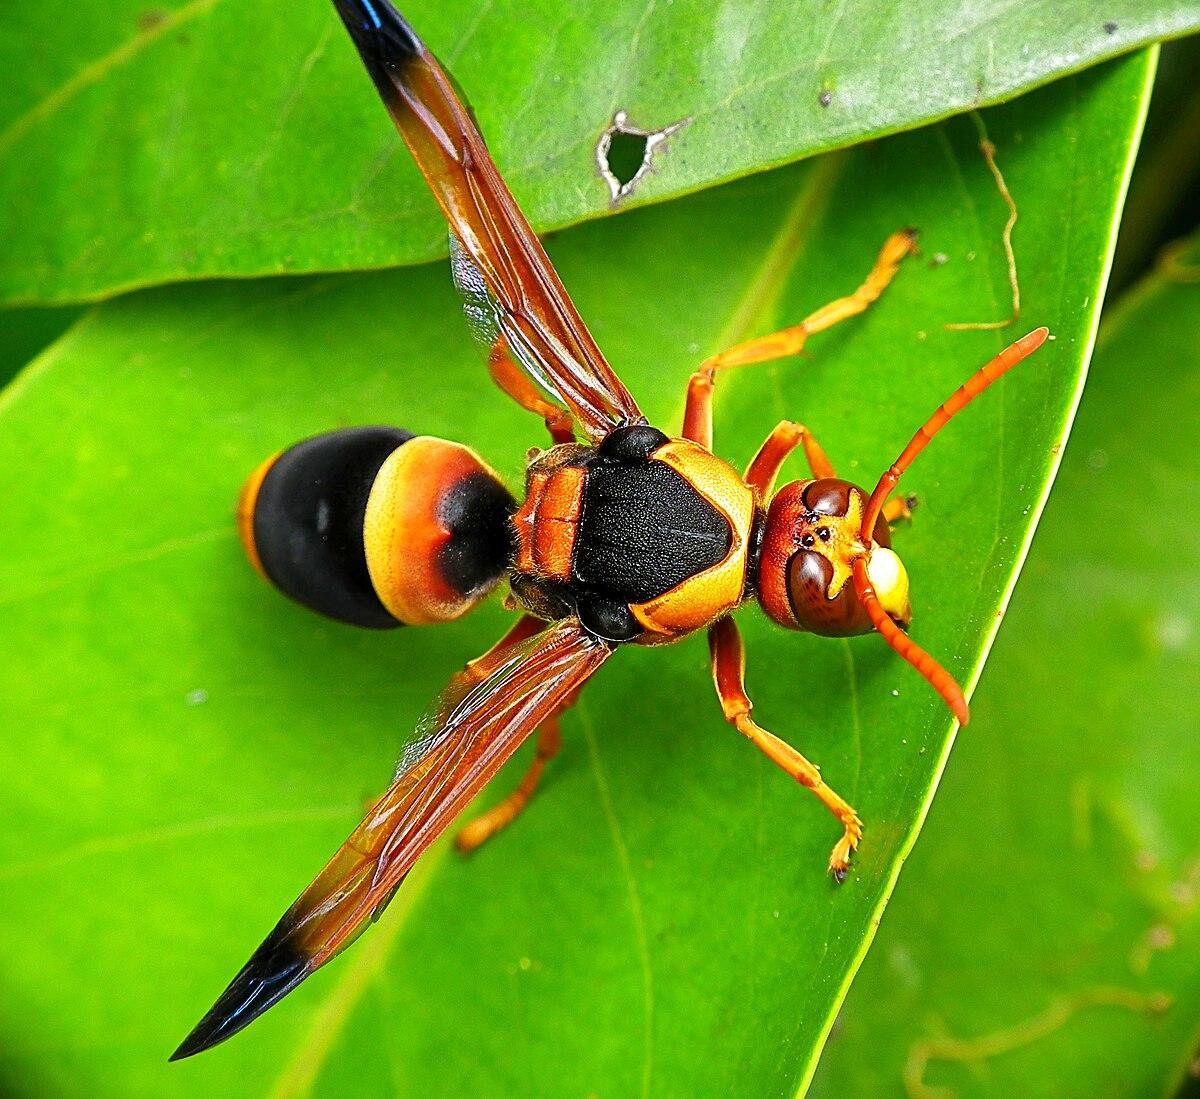 Largest Tarantula Species